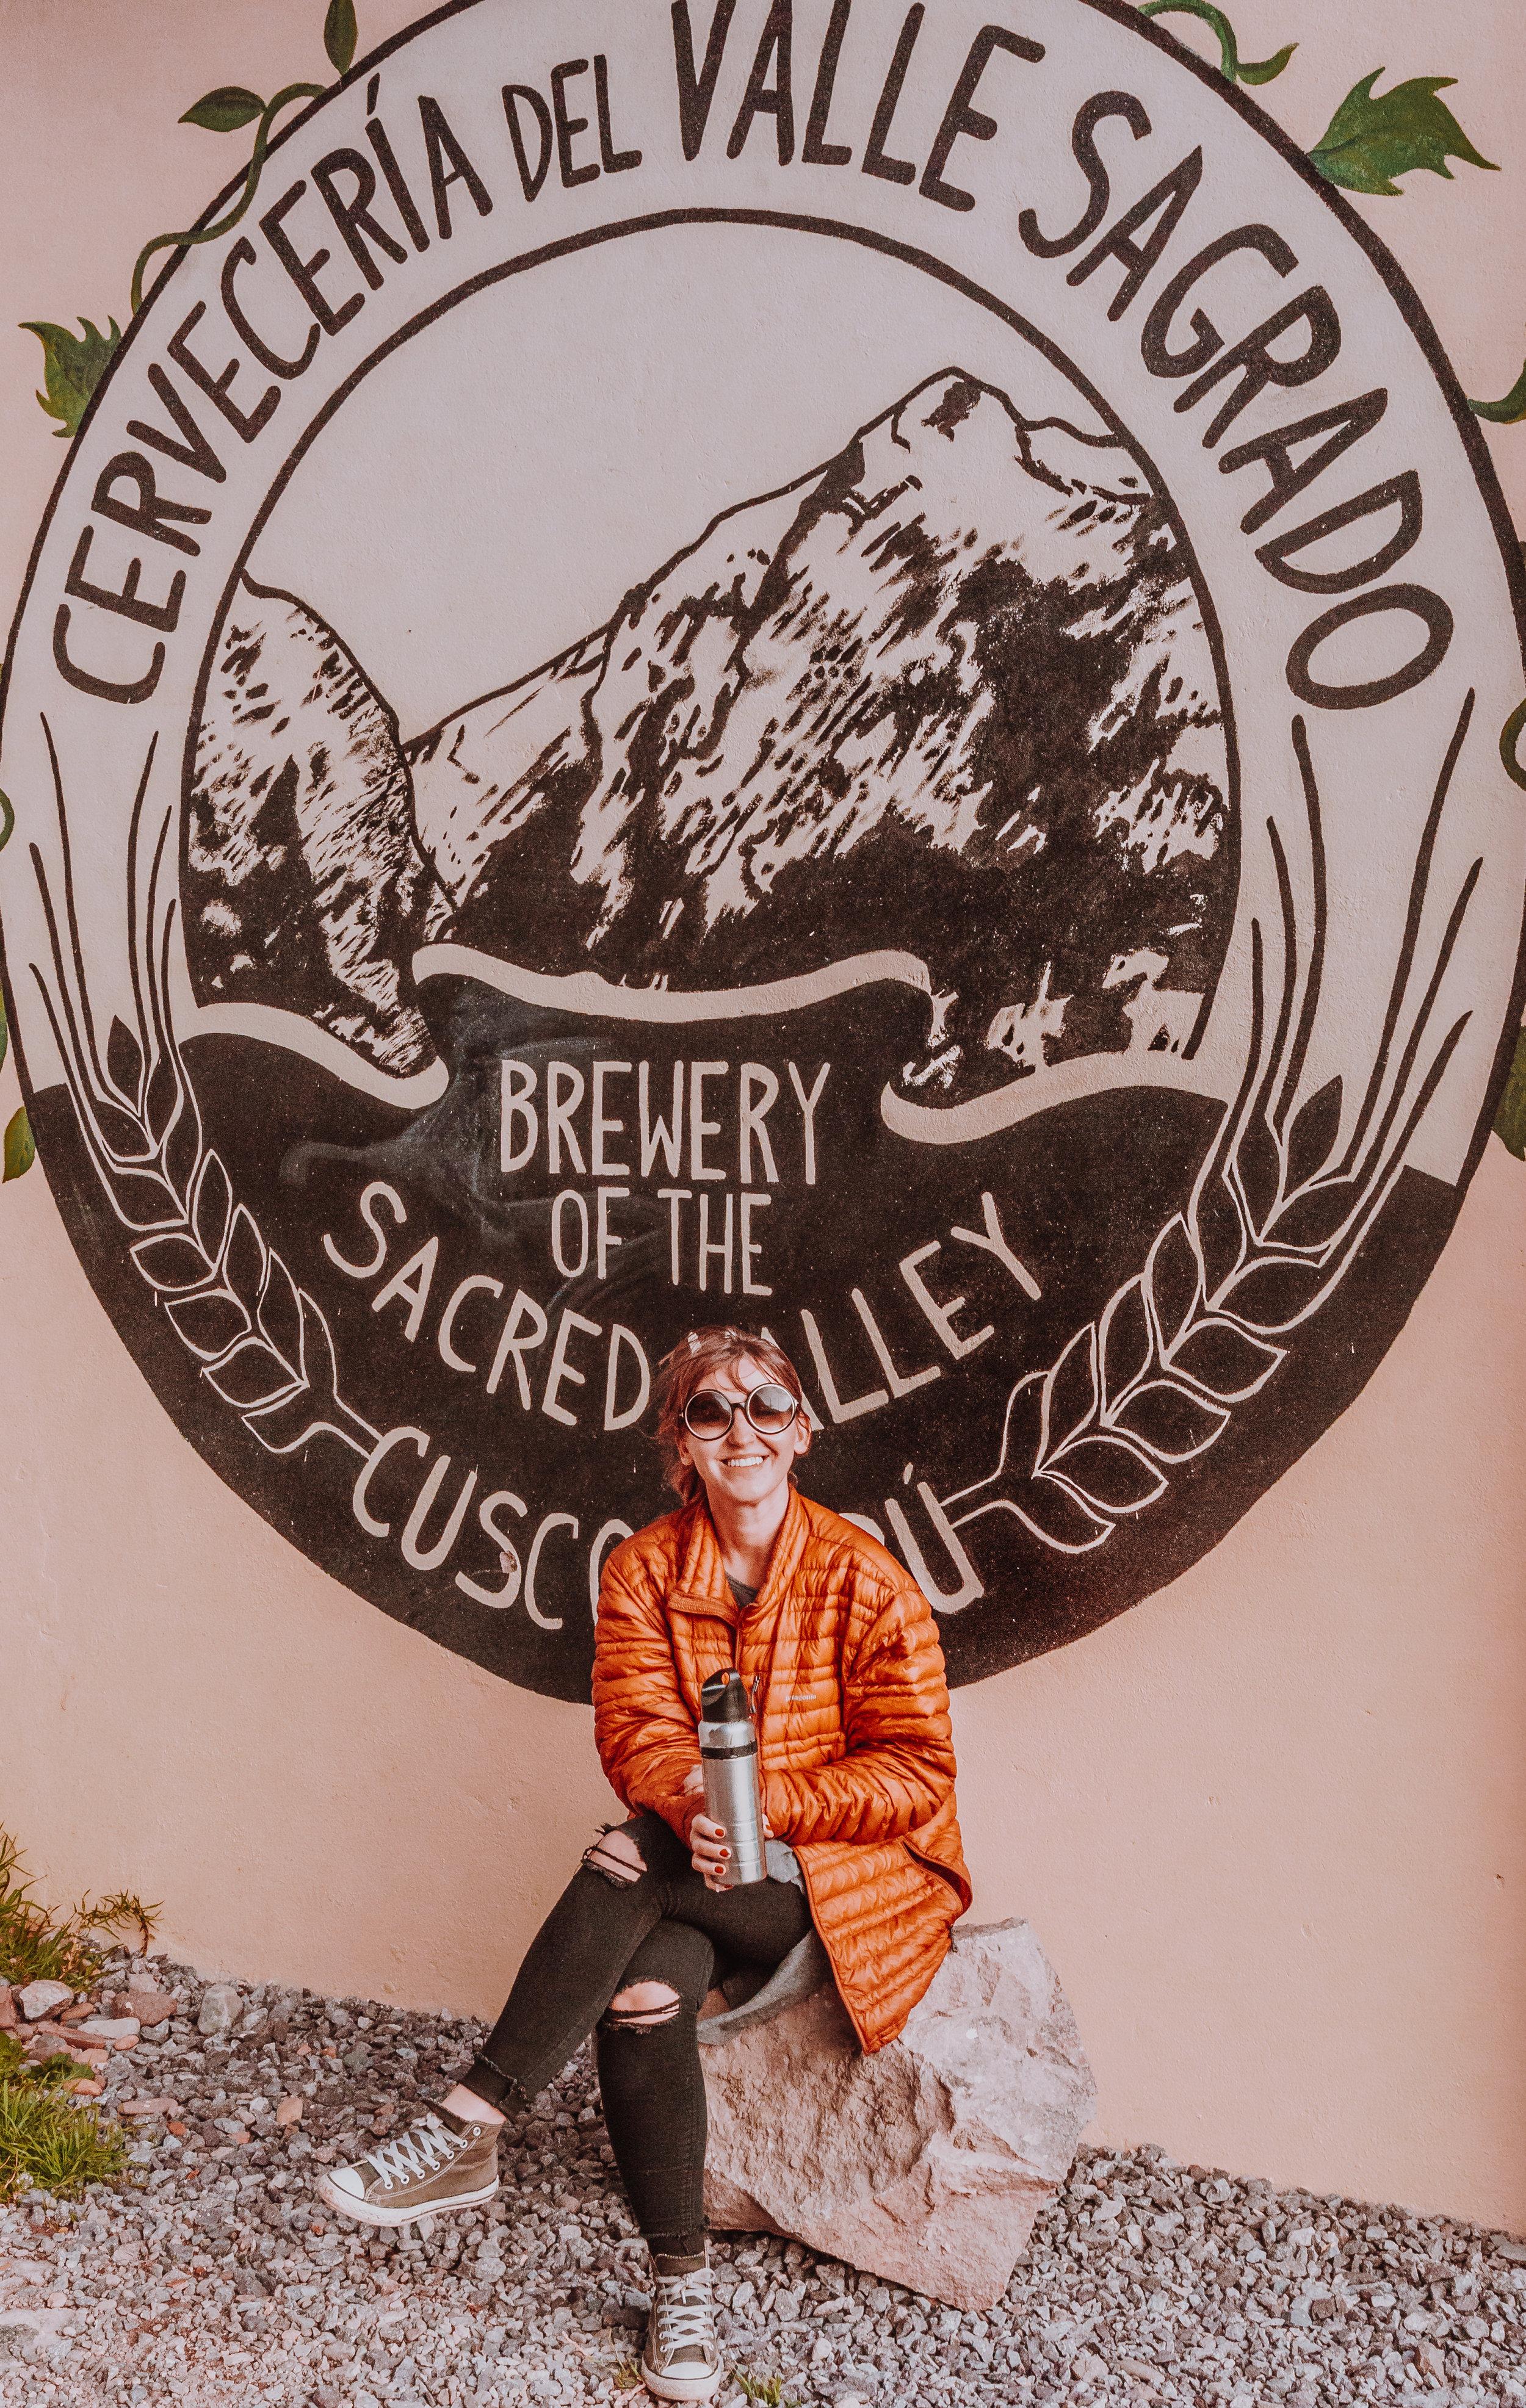 Peruvian Artisanal brewery